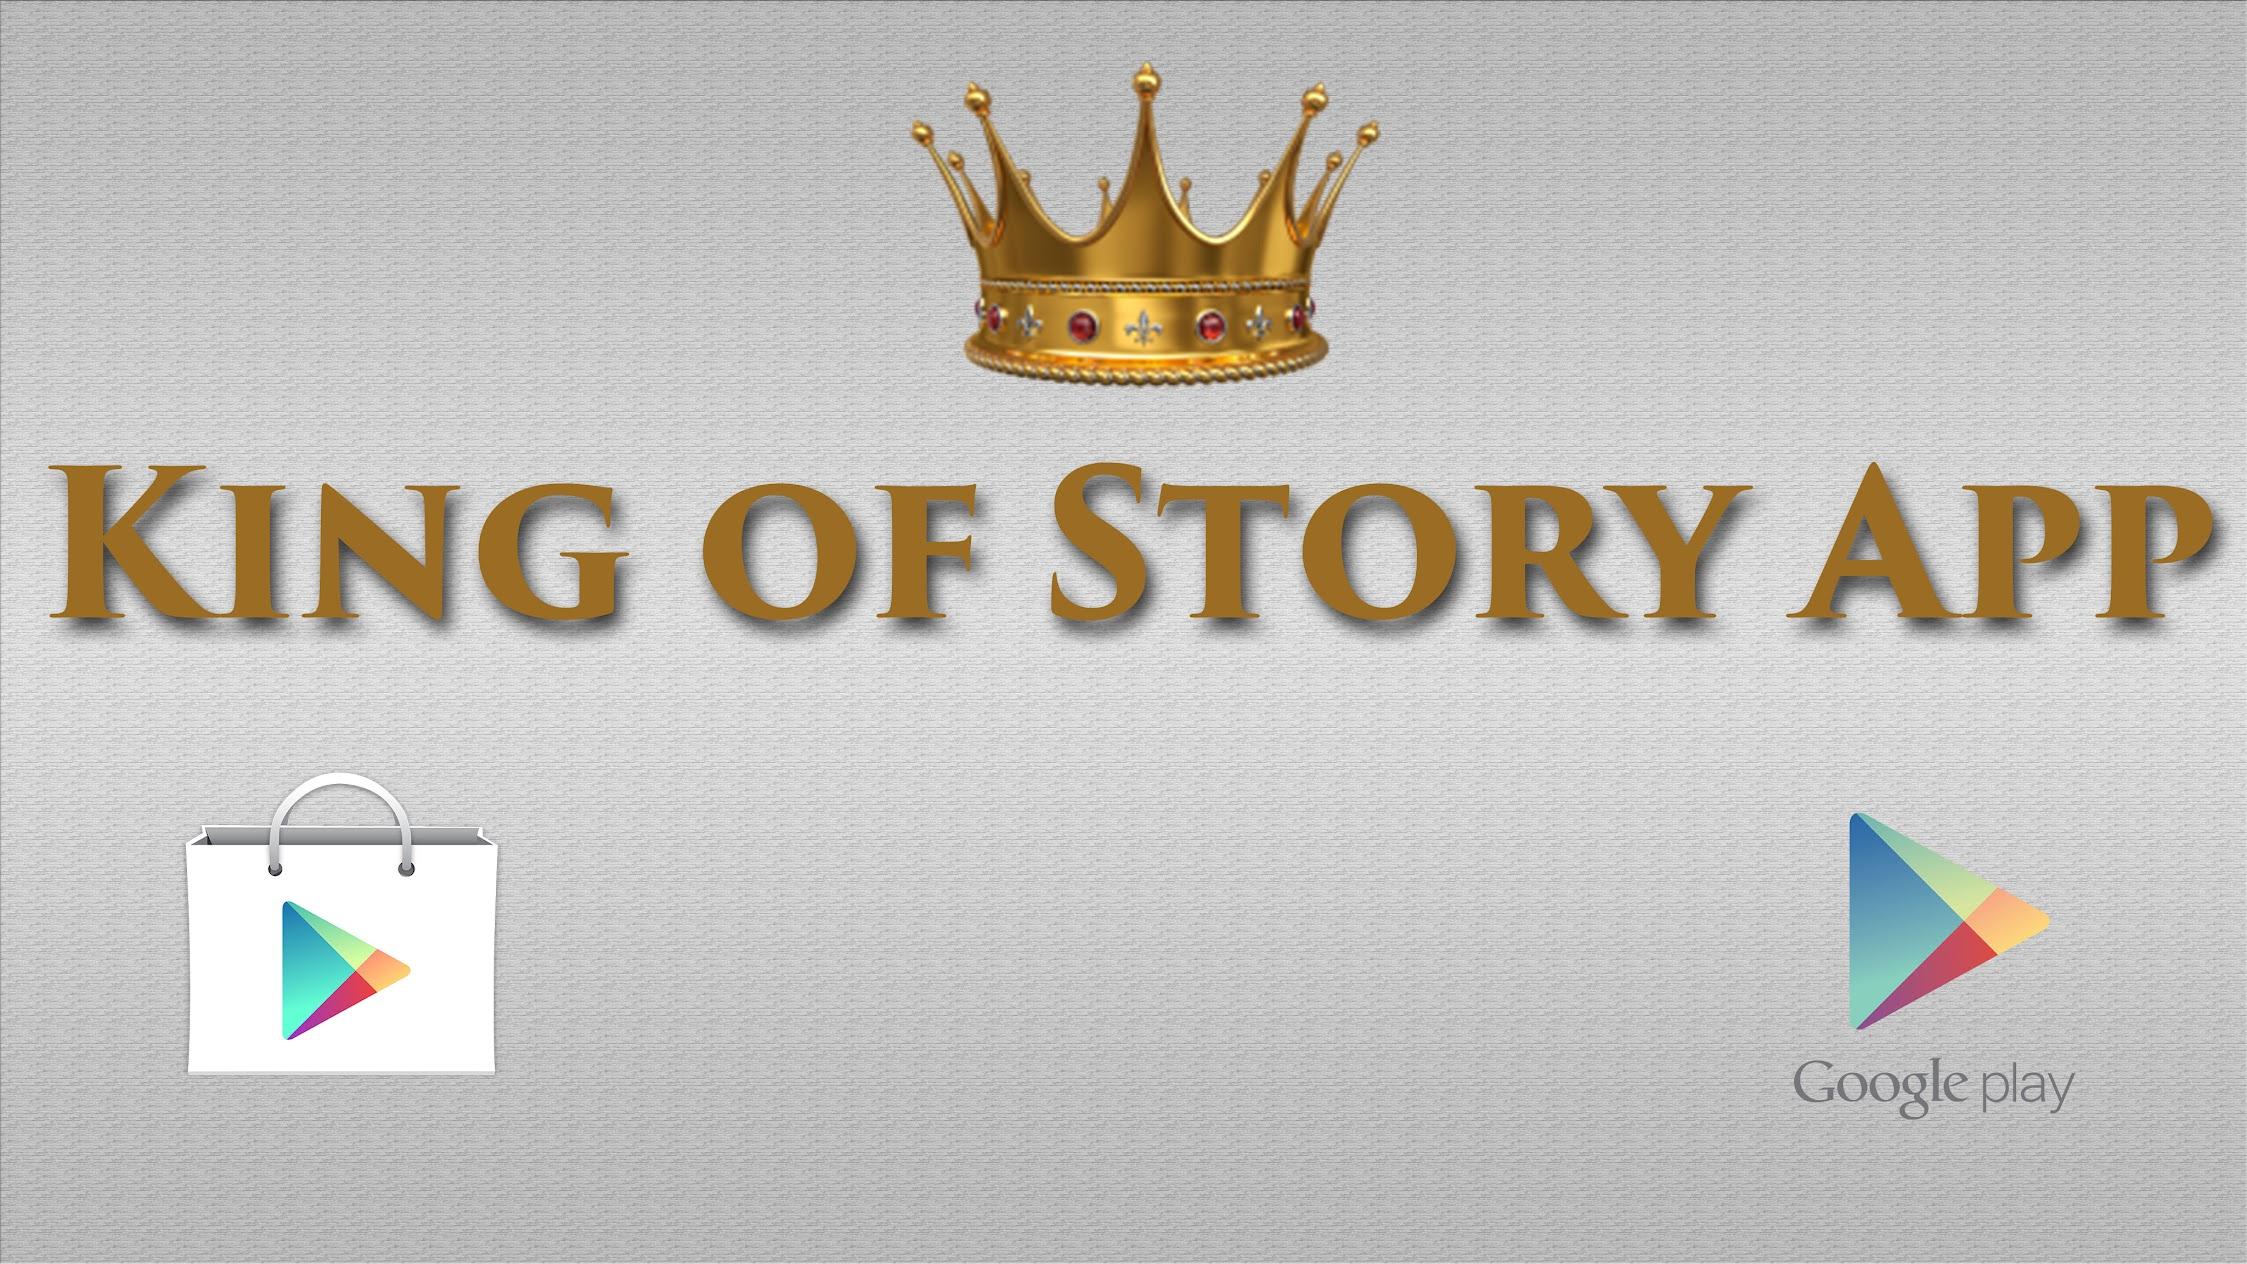 King of Story App